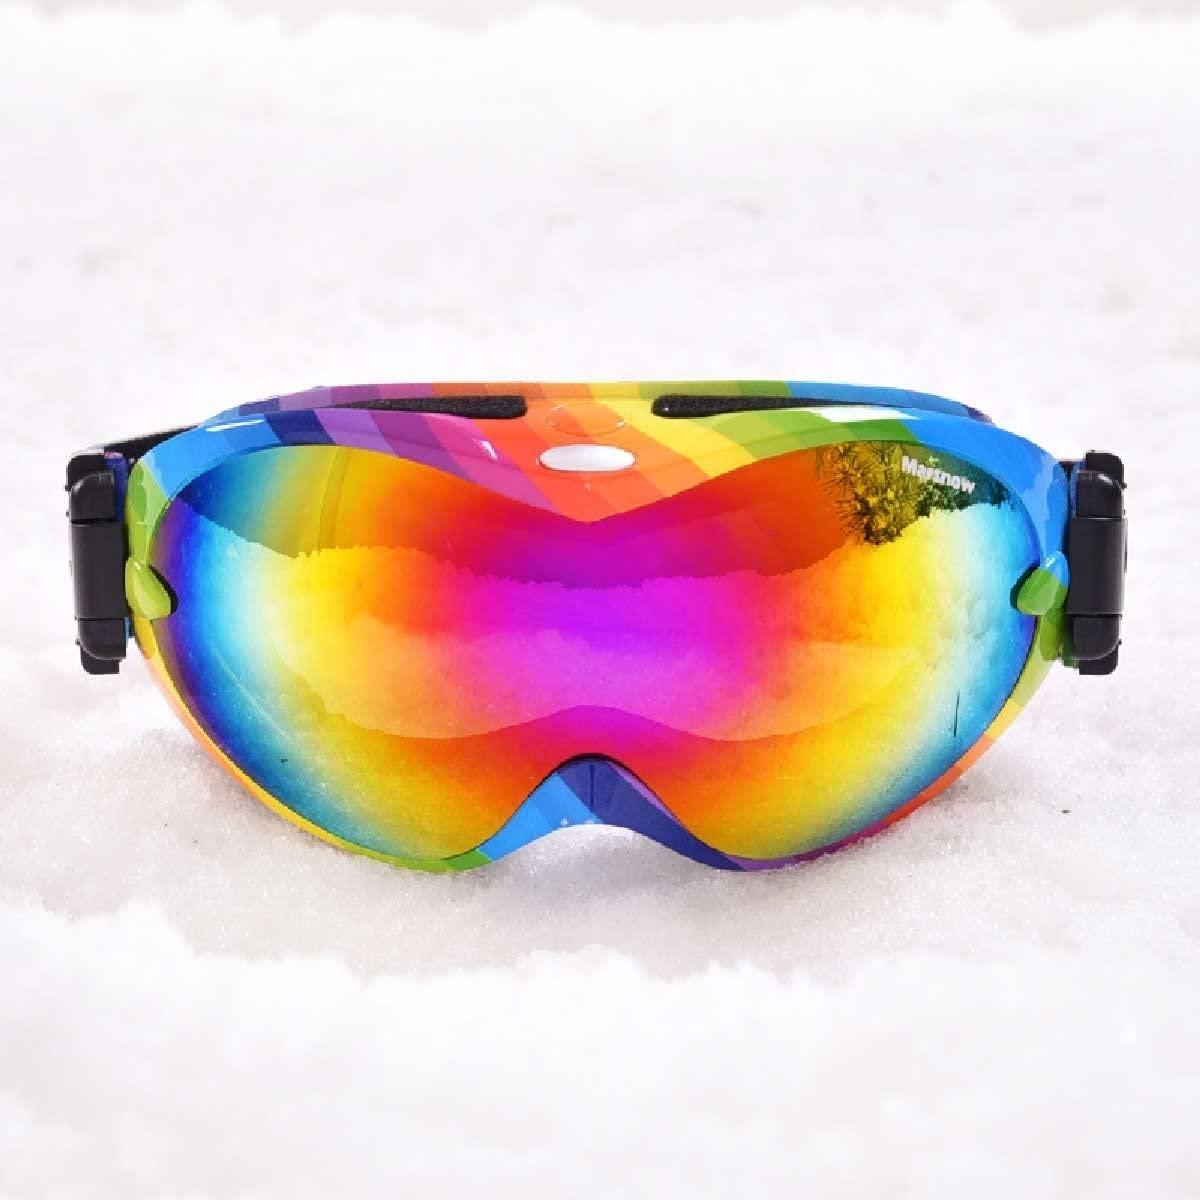 TRIWONDER Ski Goggles - Over Glasses Ski/Snowboard Goggles for Men & Women with UV Protection, Windproof, Anti Glare